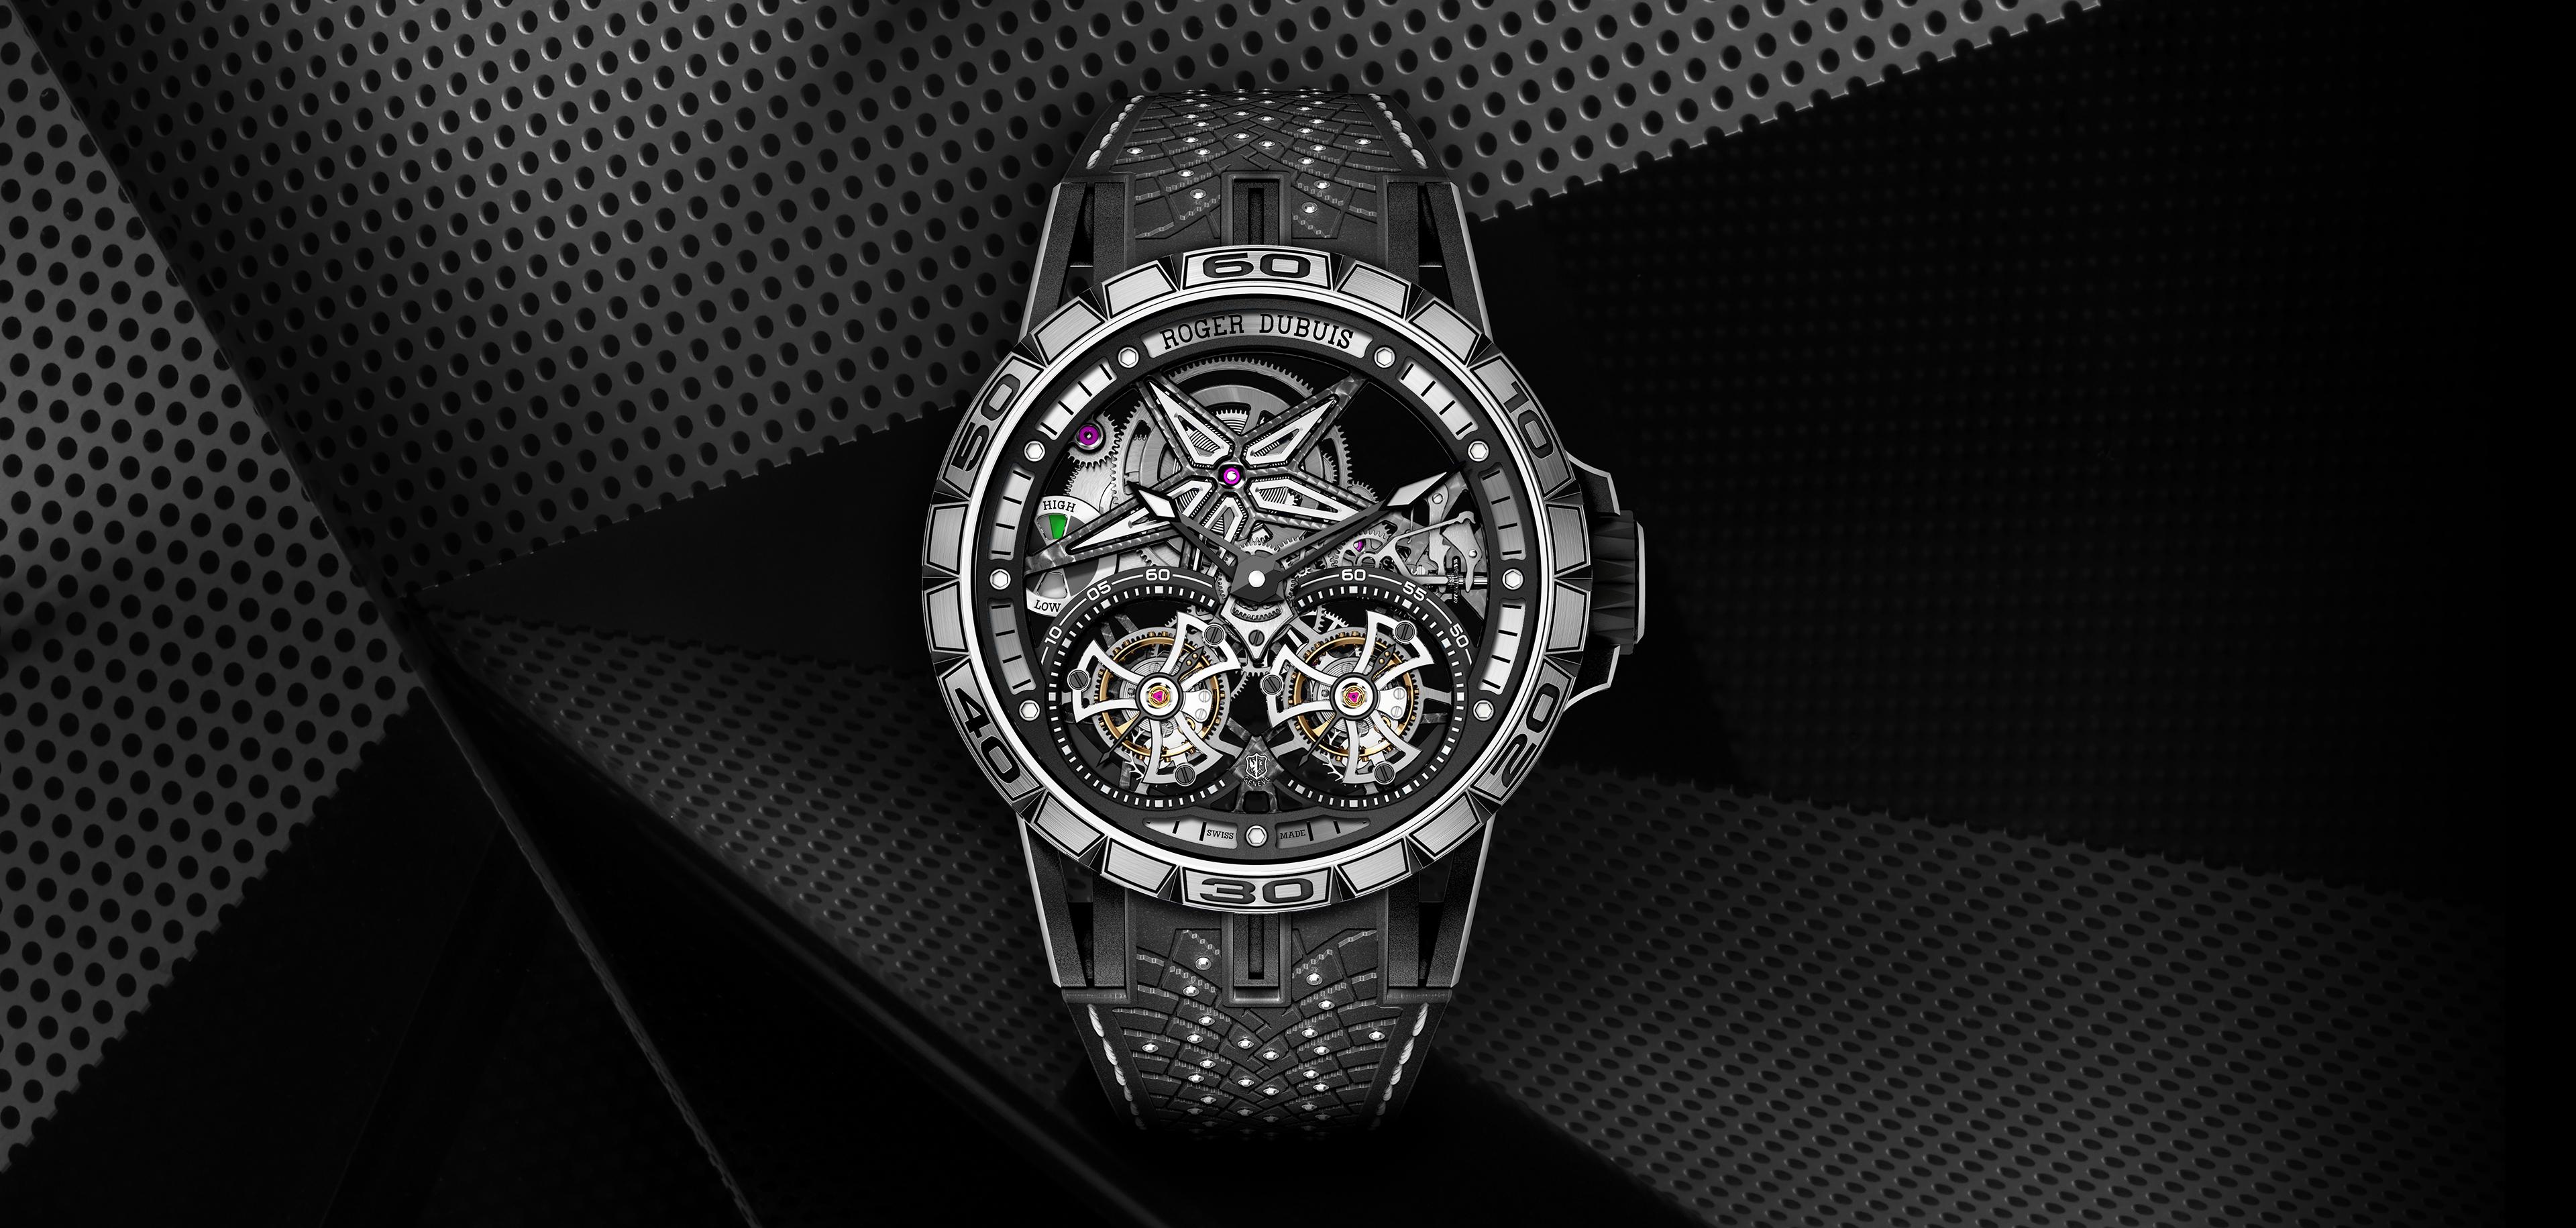 4760f8fd4 ... جيدة ليحقق قبضة مستمرّة وراحة عالية، وتعدّ الساعة تحفةً فنيةً متميزة  للغاية بها توربيون، ومدعومةً من العيار Poinçon de Geneve بشهادة Calibre  RD105SQ.